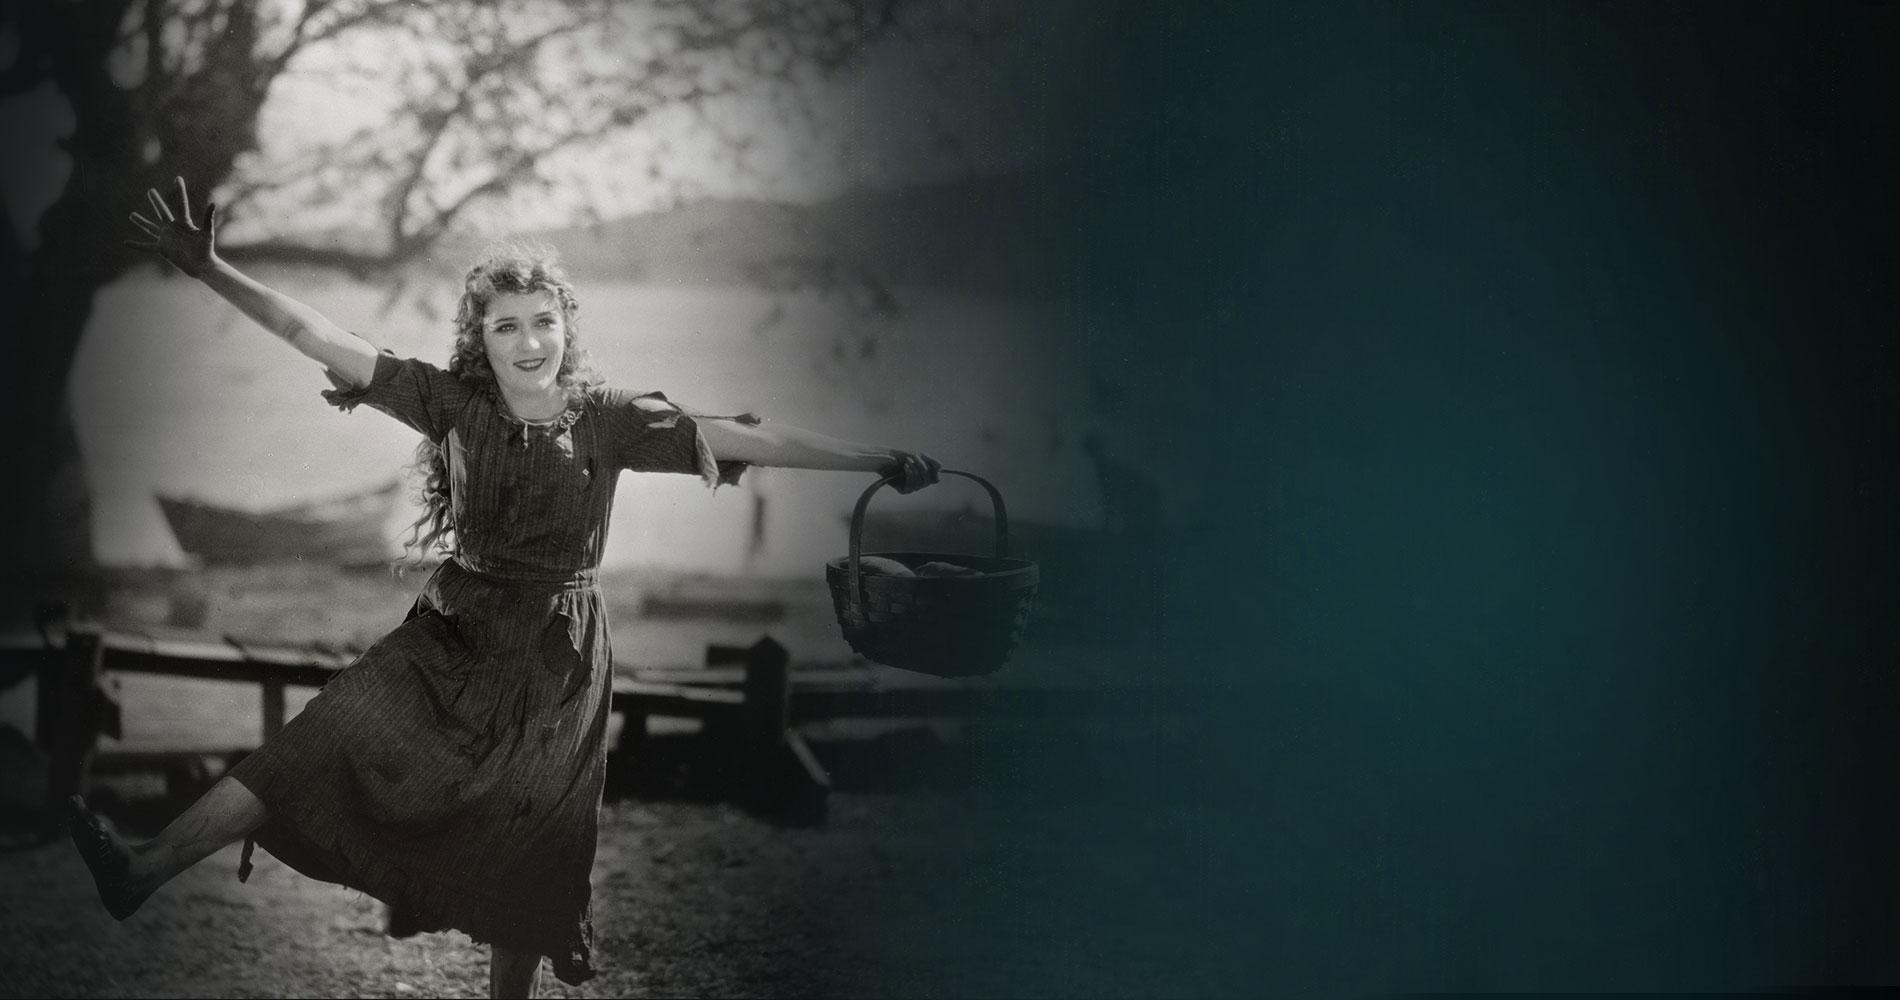 mary-pickford-scrapbook-waif-silen-film-stories3